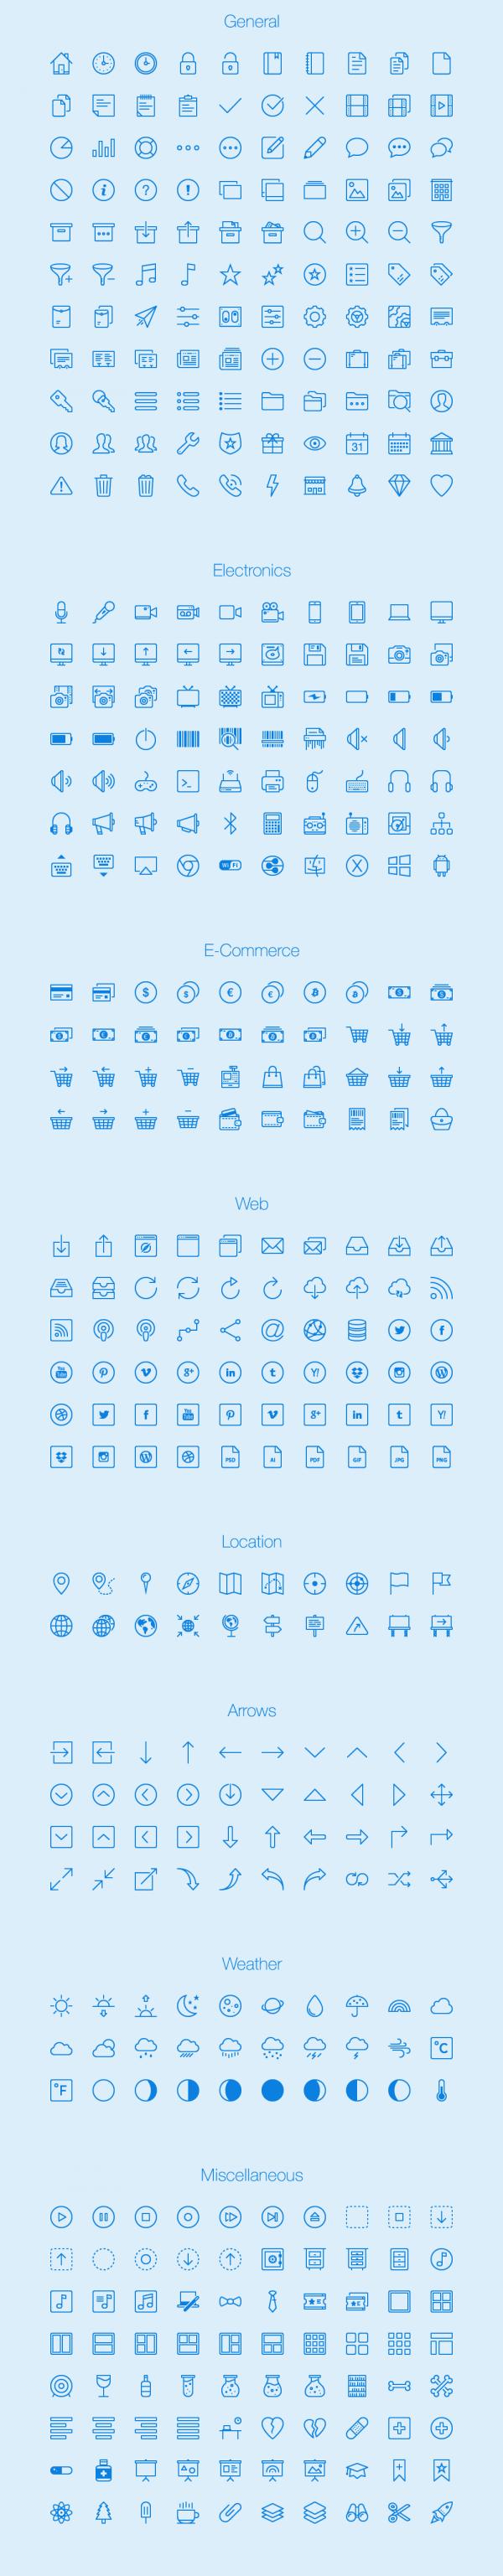 Lynny Icons - Full vector